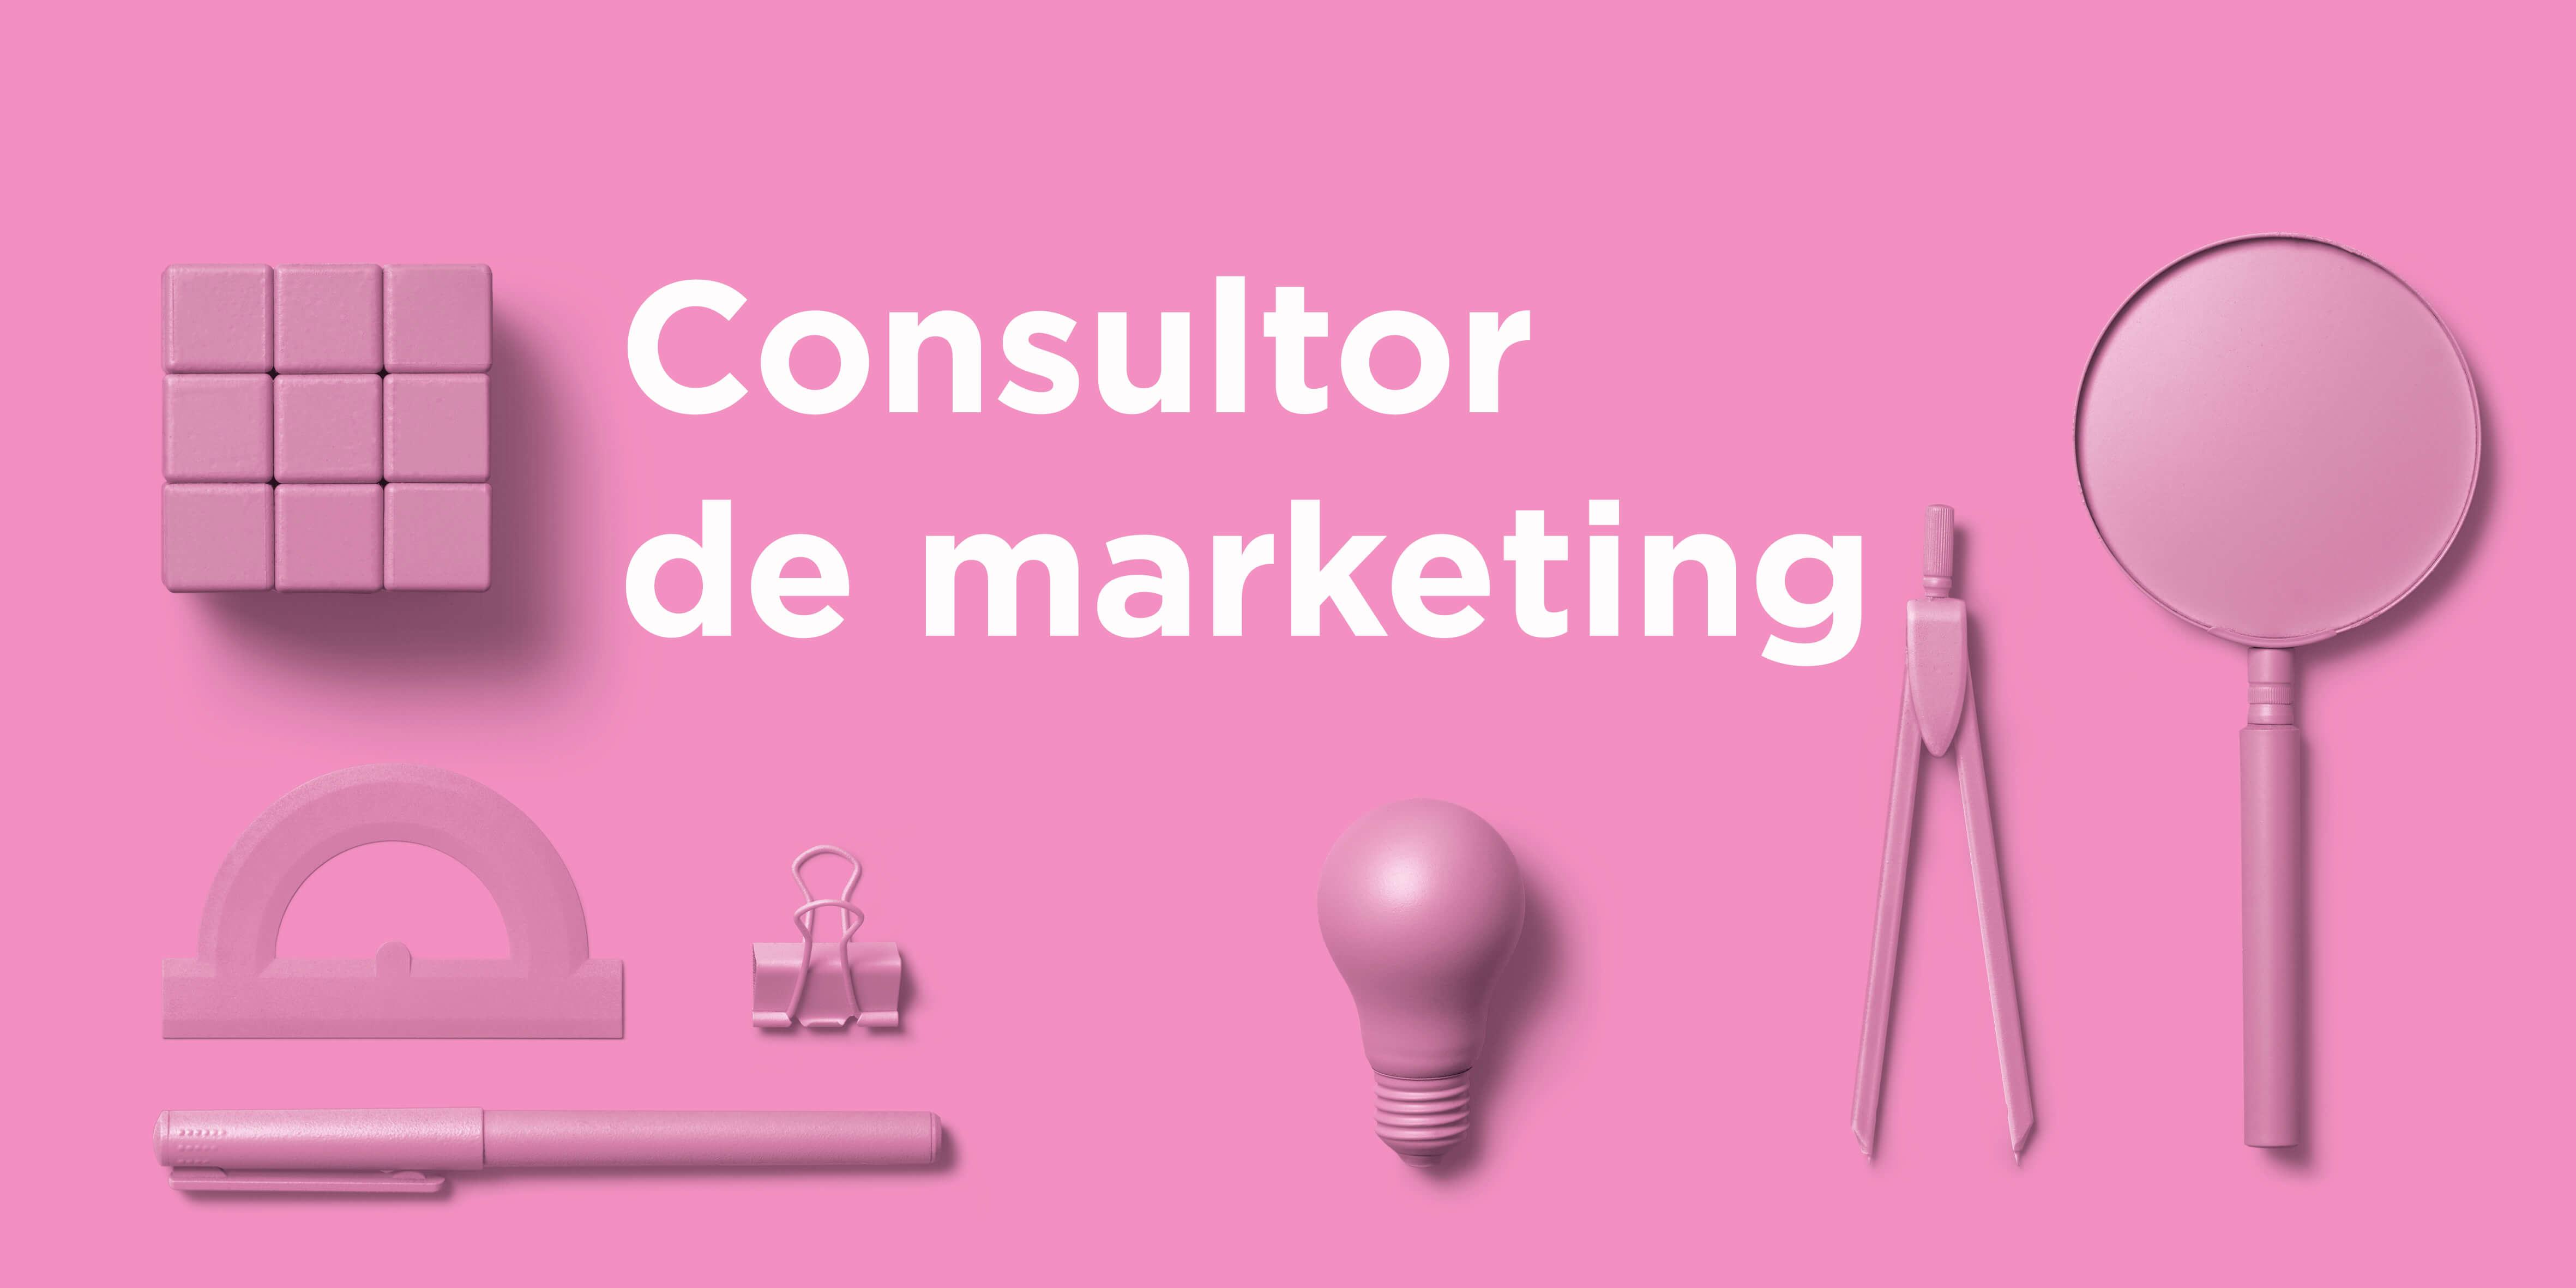 Consultor de marketing tiny